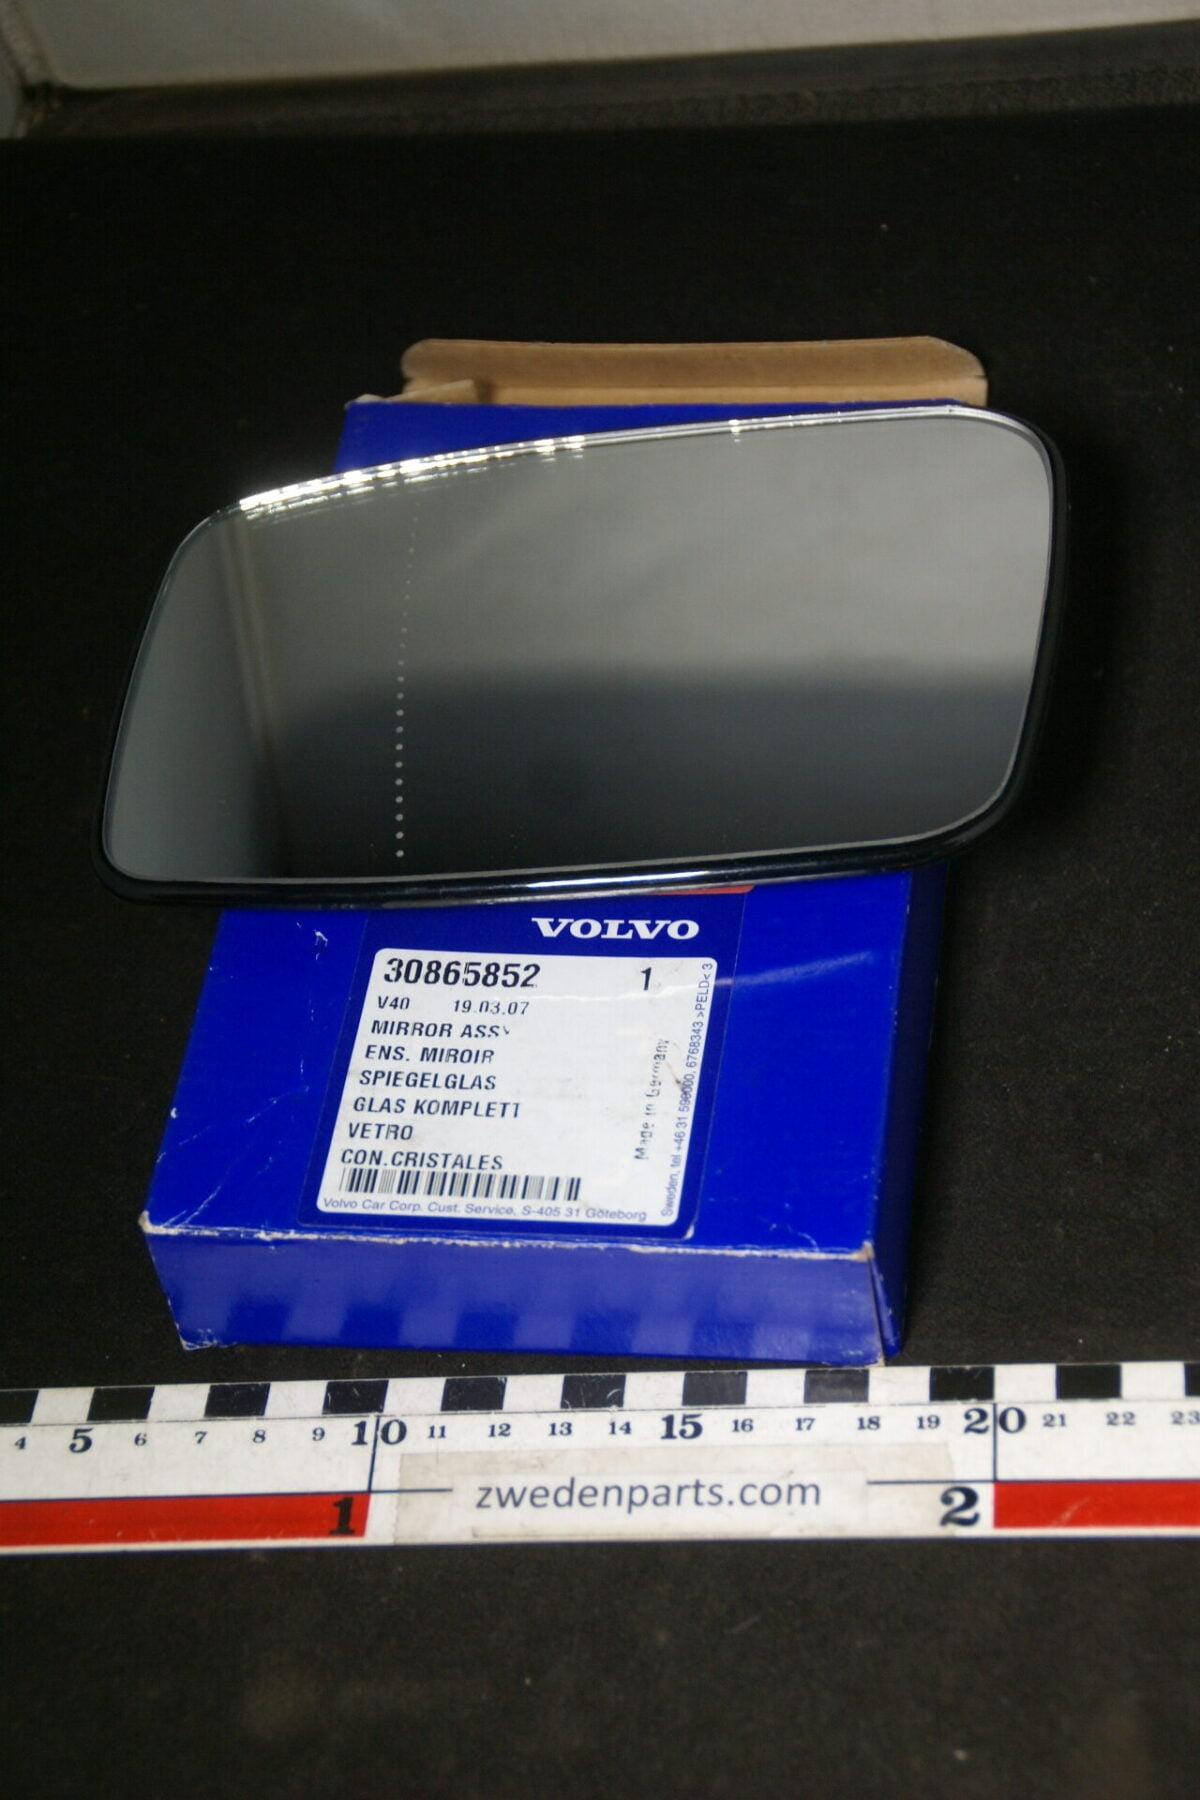 DSC04324 origineel spiegelglas Volvo 850 CSVXC70 links nr 30865852 NOS-0d56b0f4